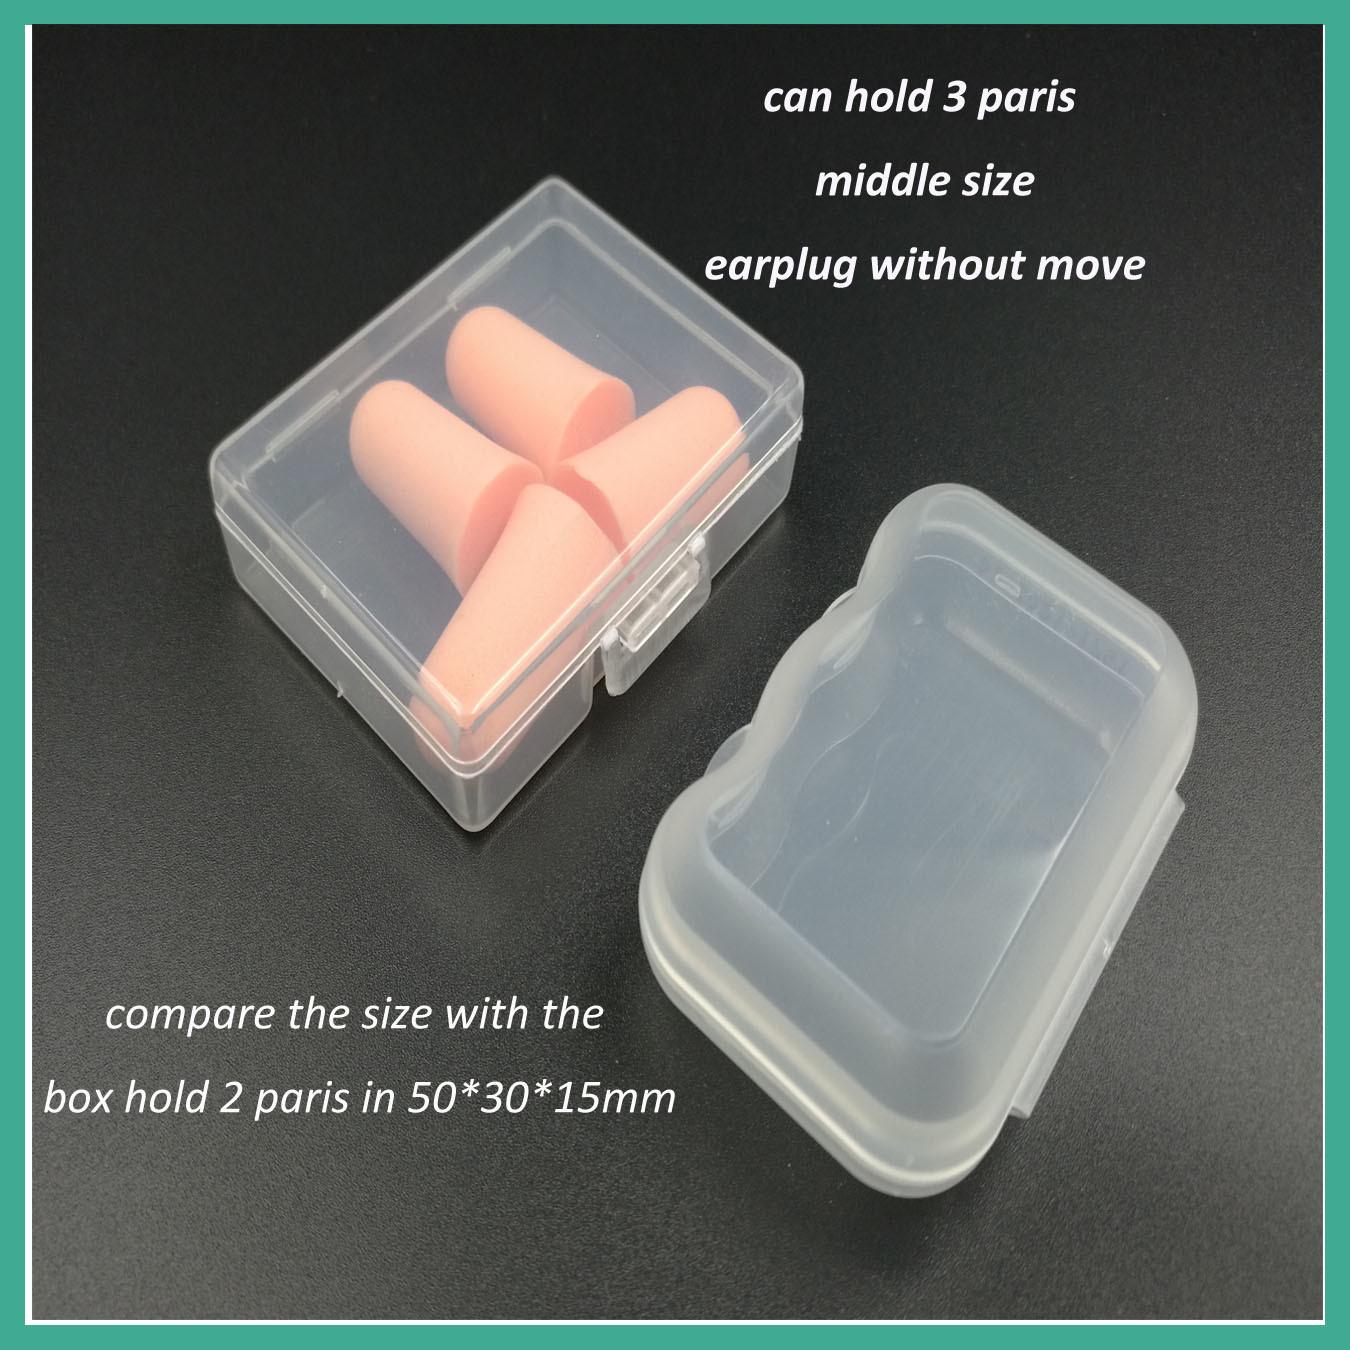 Small Earplug Packaging Box with 1 Pair 2 Paris or 3 Paris